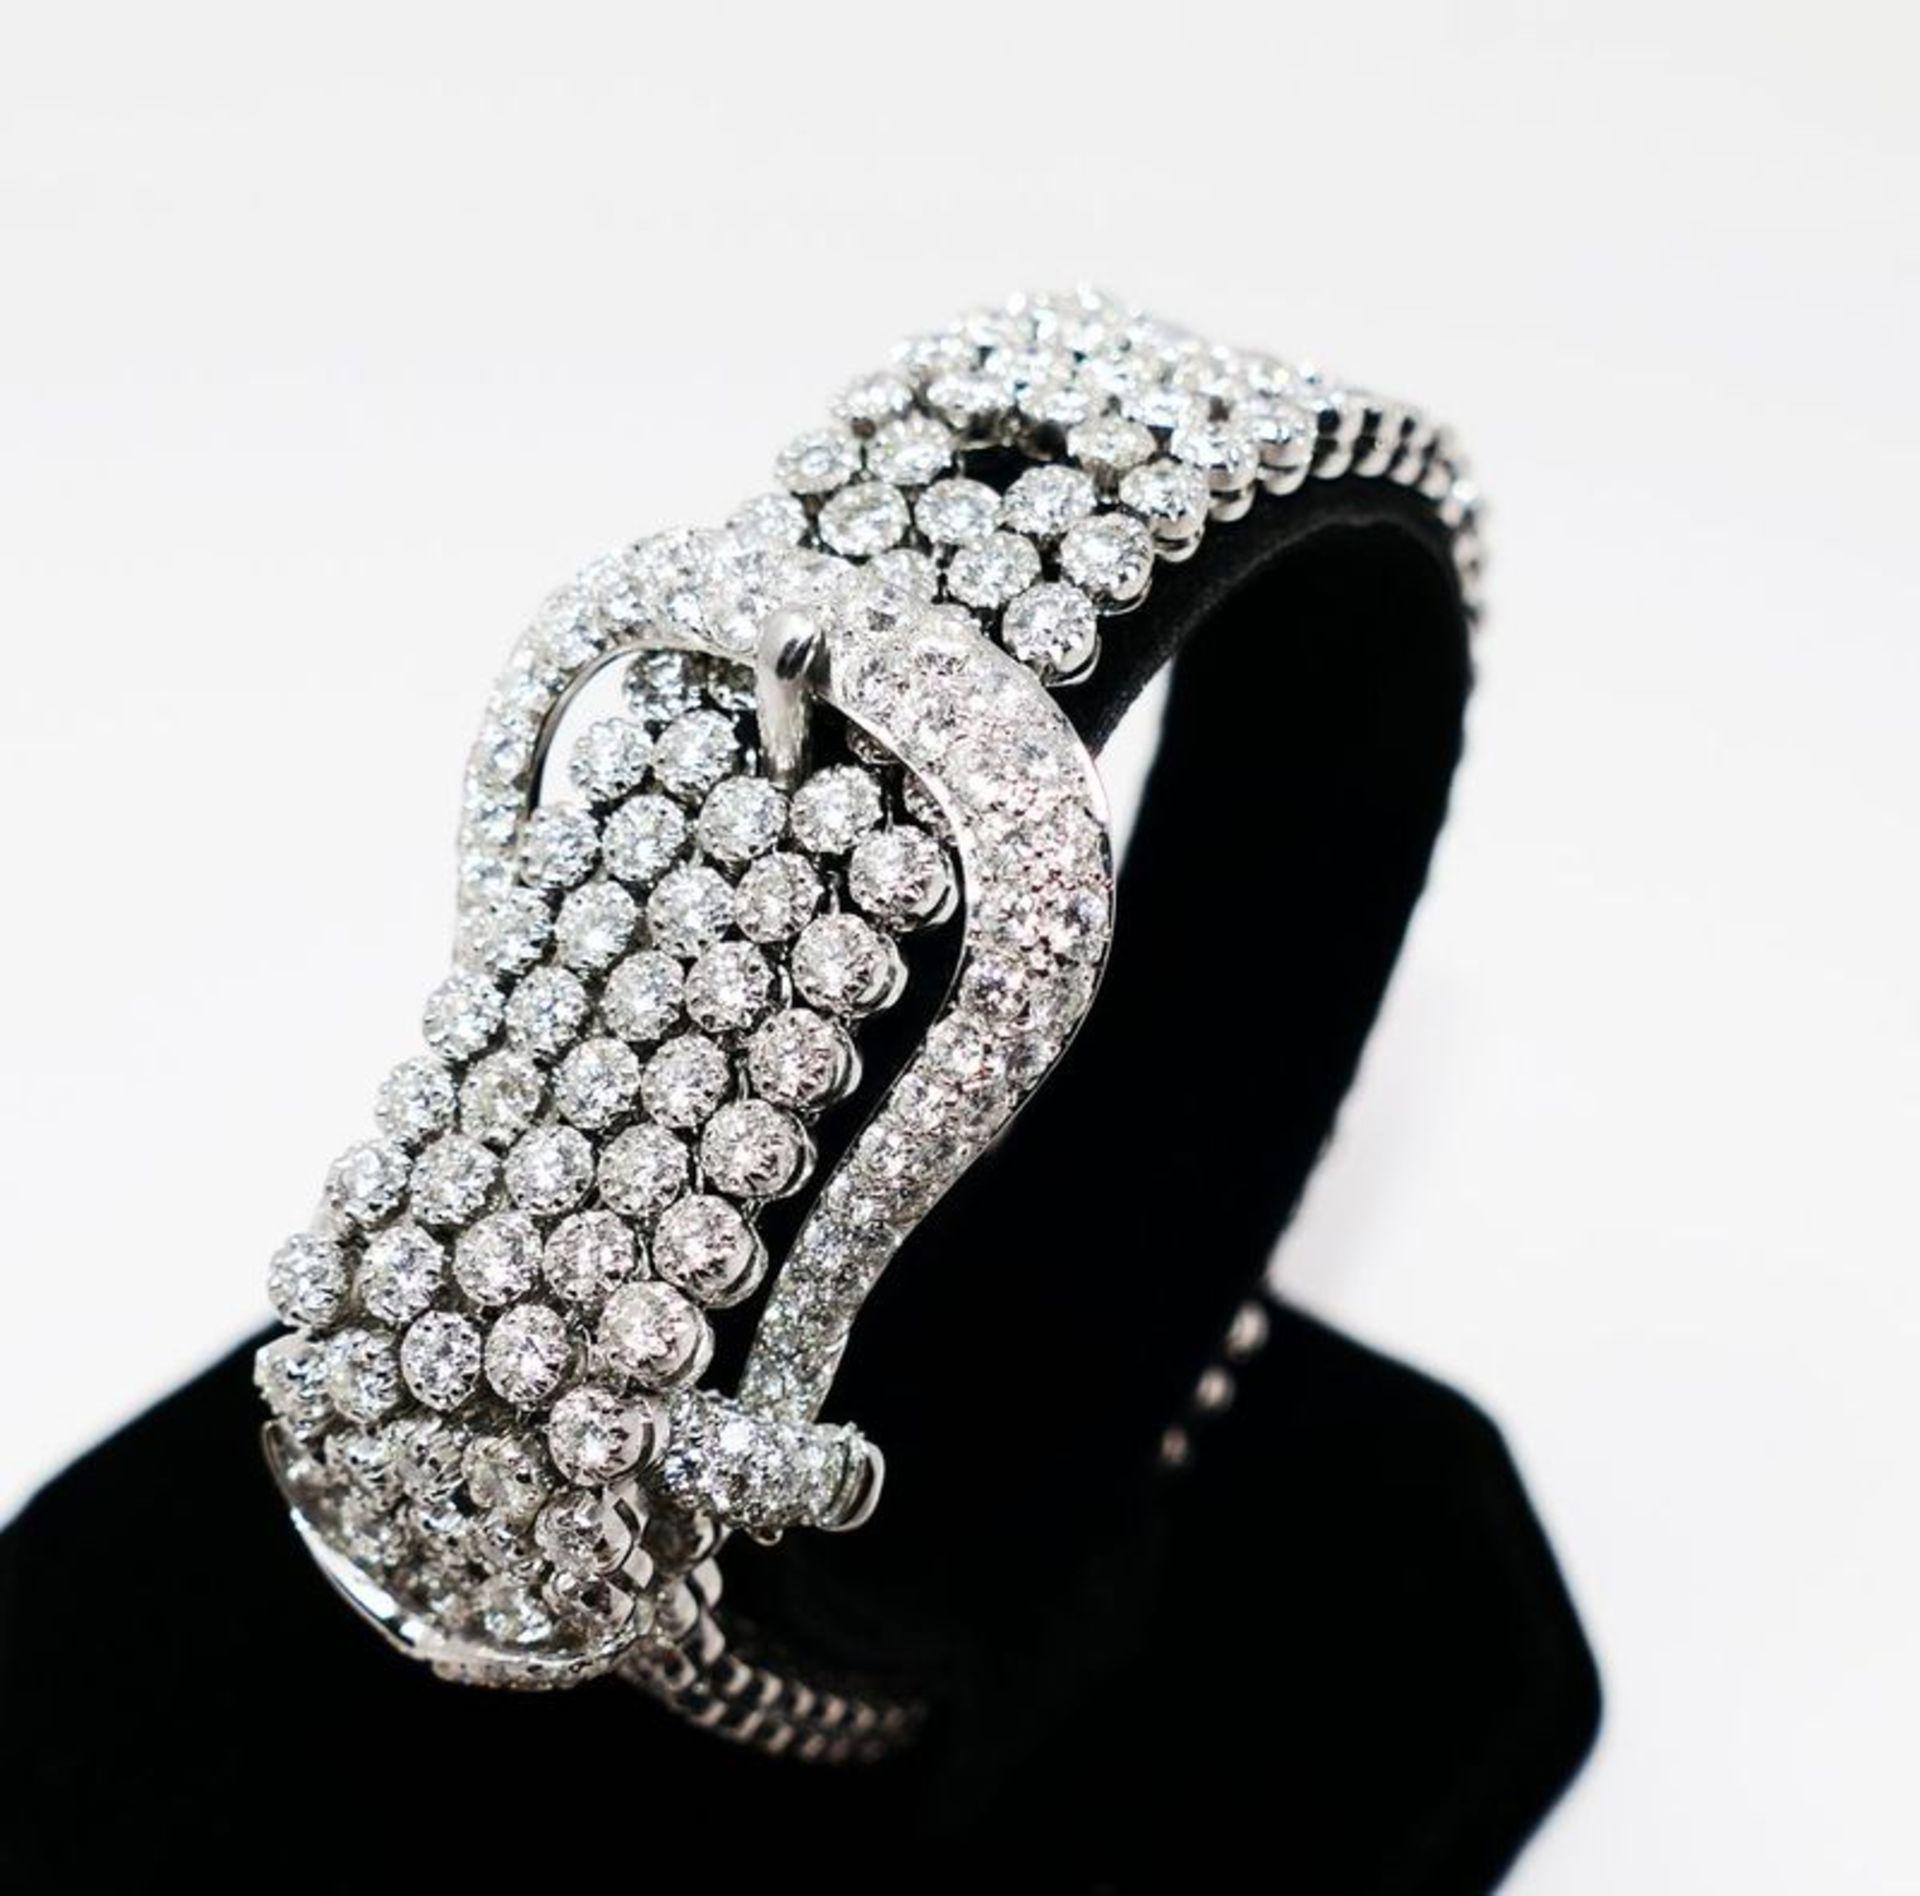 ELEGANT 25 CT BRACELET WITH DIAMONDS - 25ct, Valenza manufacturing (Italy) White [...] - Bild 4 aus 4